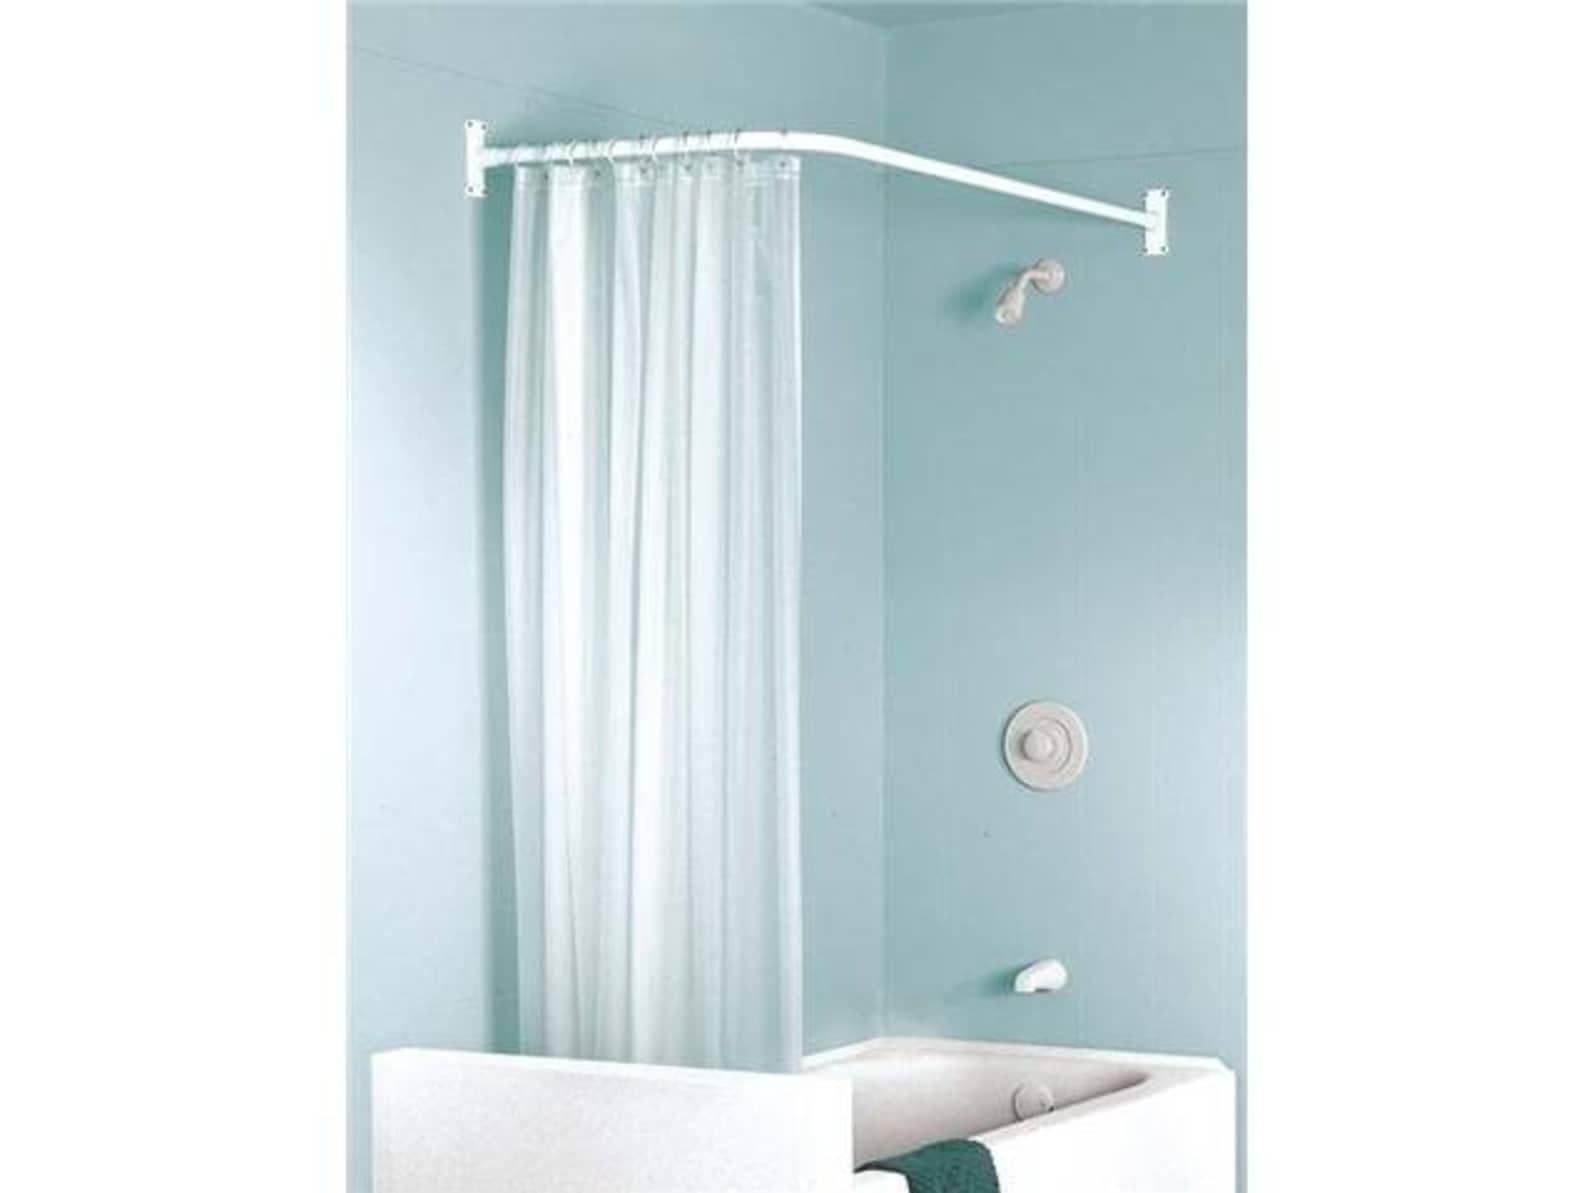 Problem Solvers 10 Uniquely Shaped Shower Curtain Rods Gallery Image 2 Shower Curtain Rods Stall Shower Curtain Modern Shower Curtains